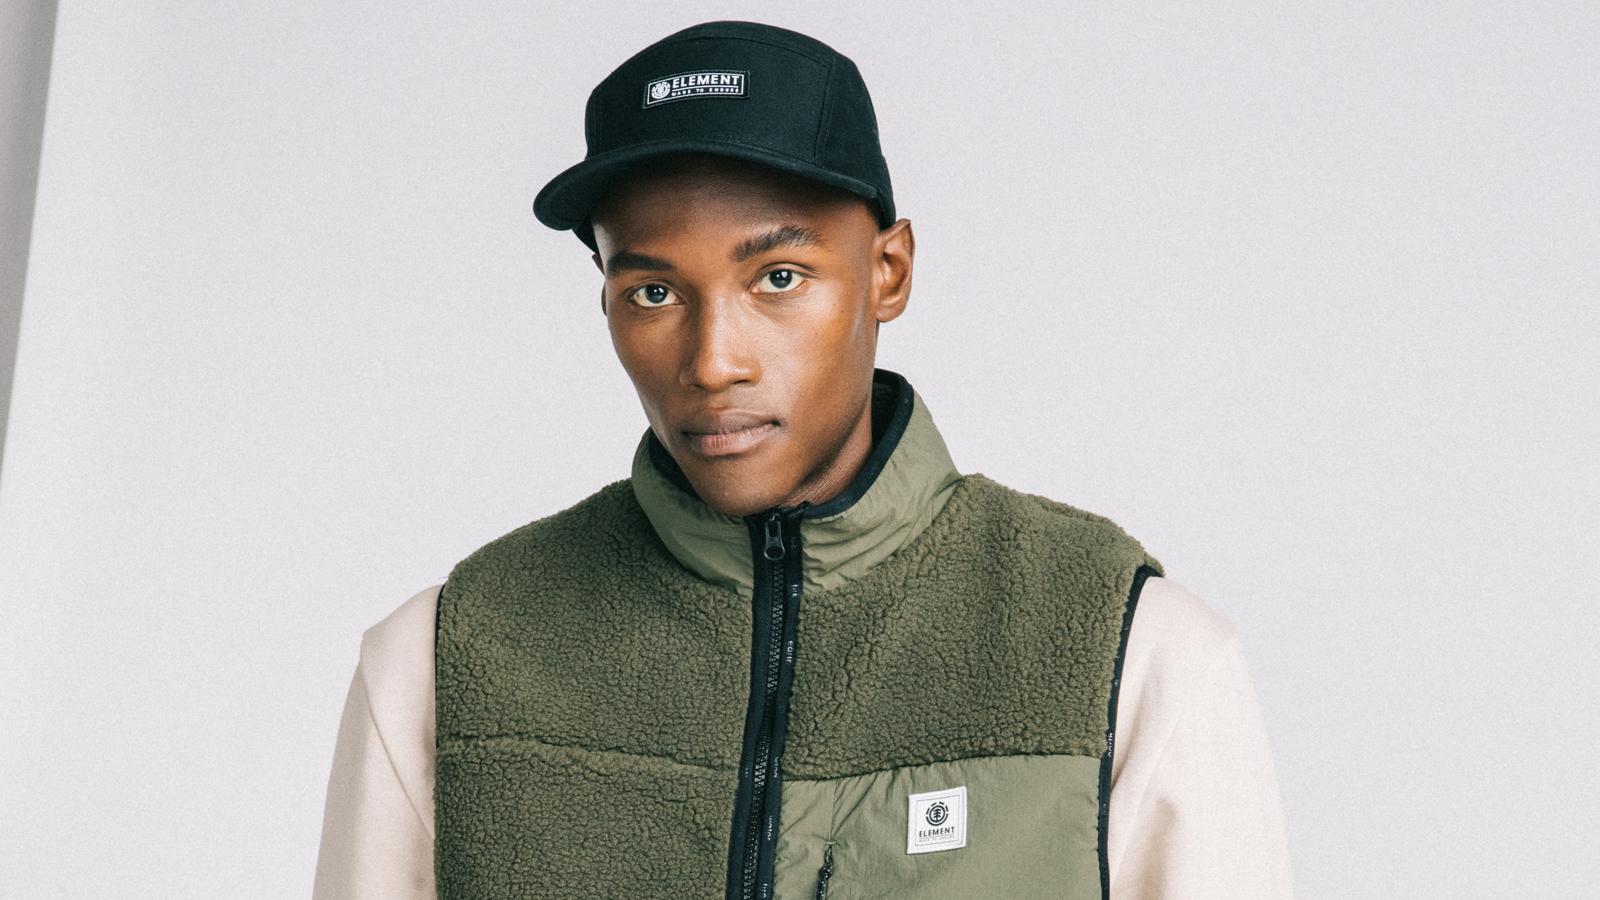 Element FW 2021 Men's Streetwear Preview